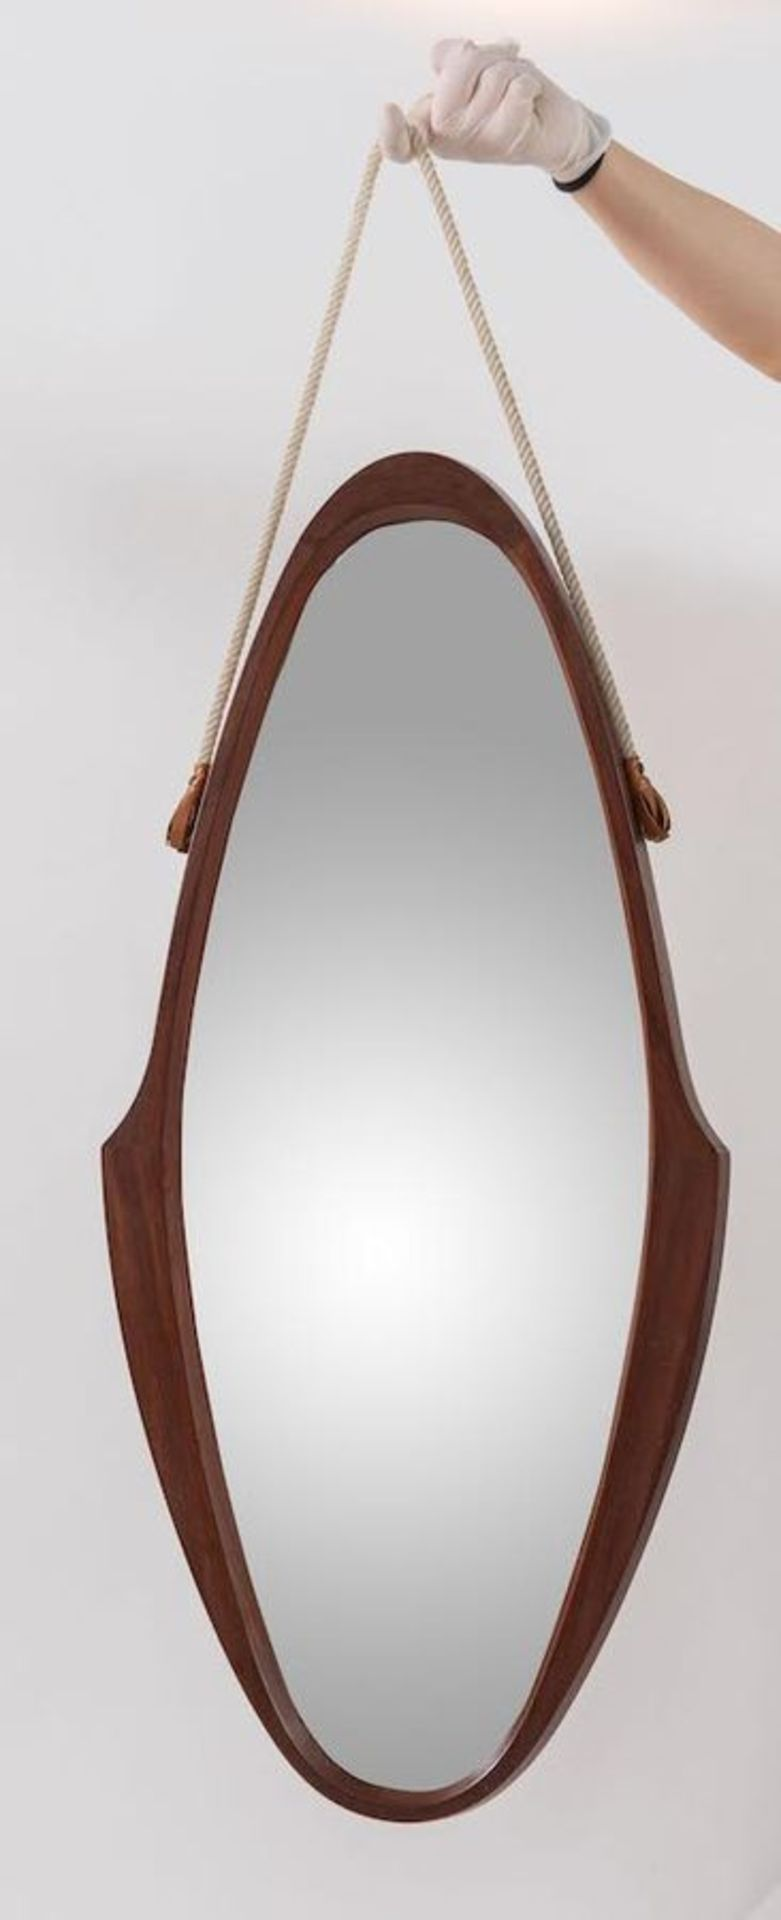 Specchio in teak con corda. Prod. Italia, 1960 ca. Cm 84x38,5x3,5.